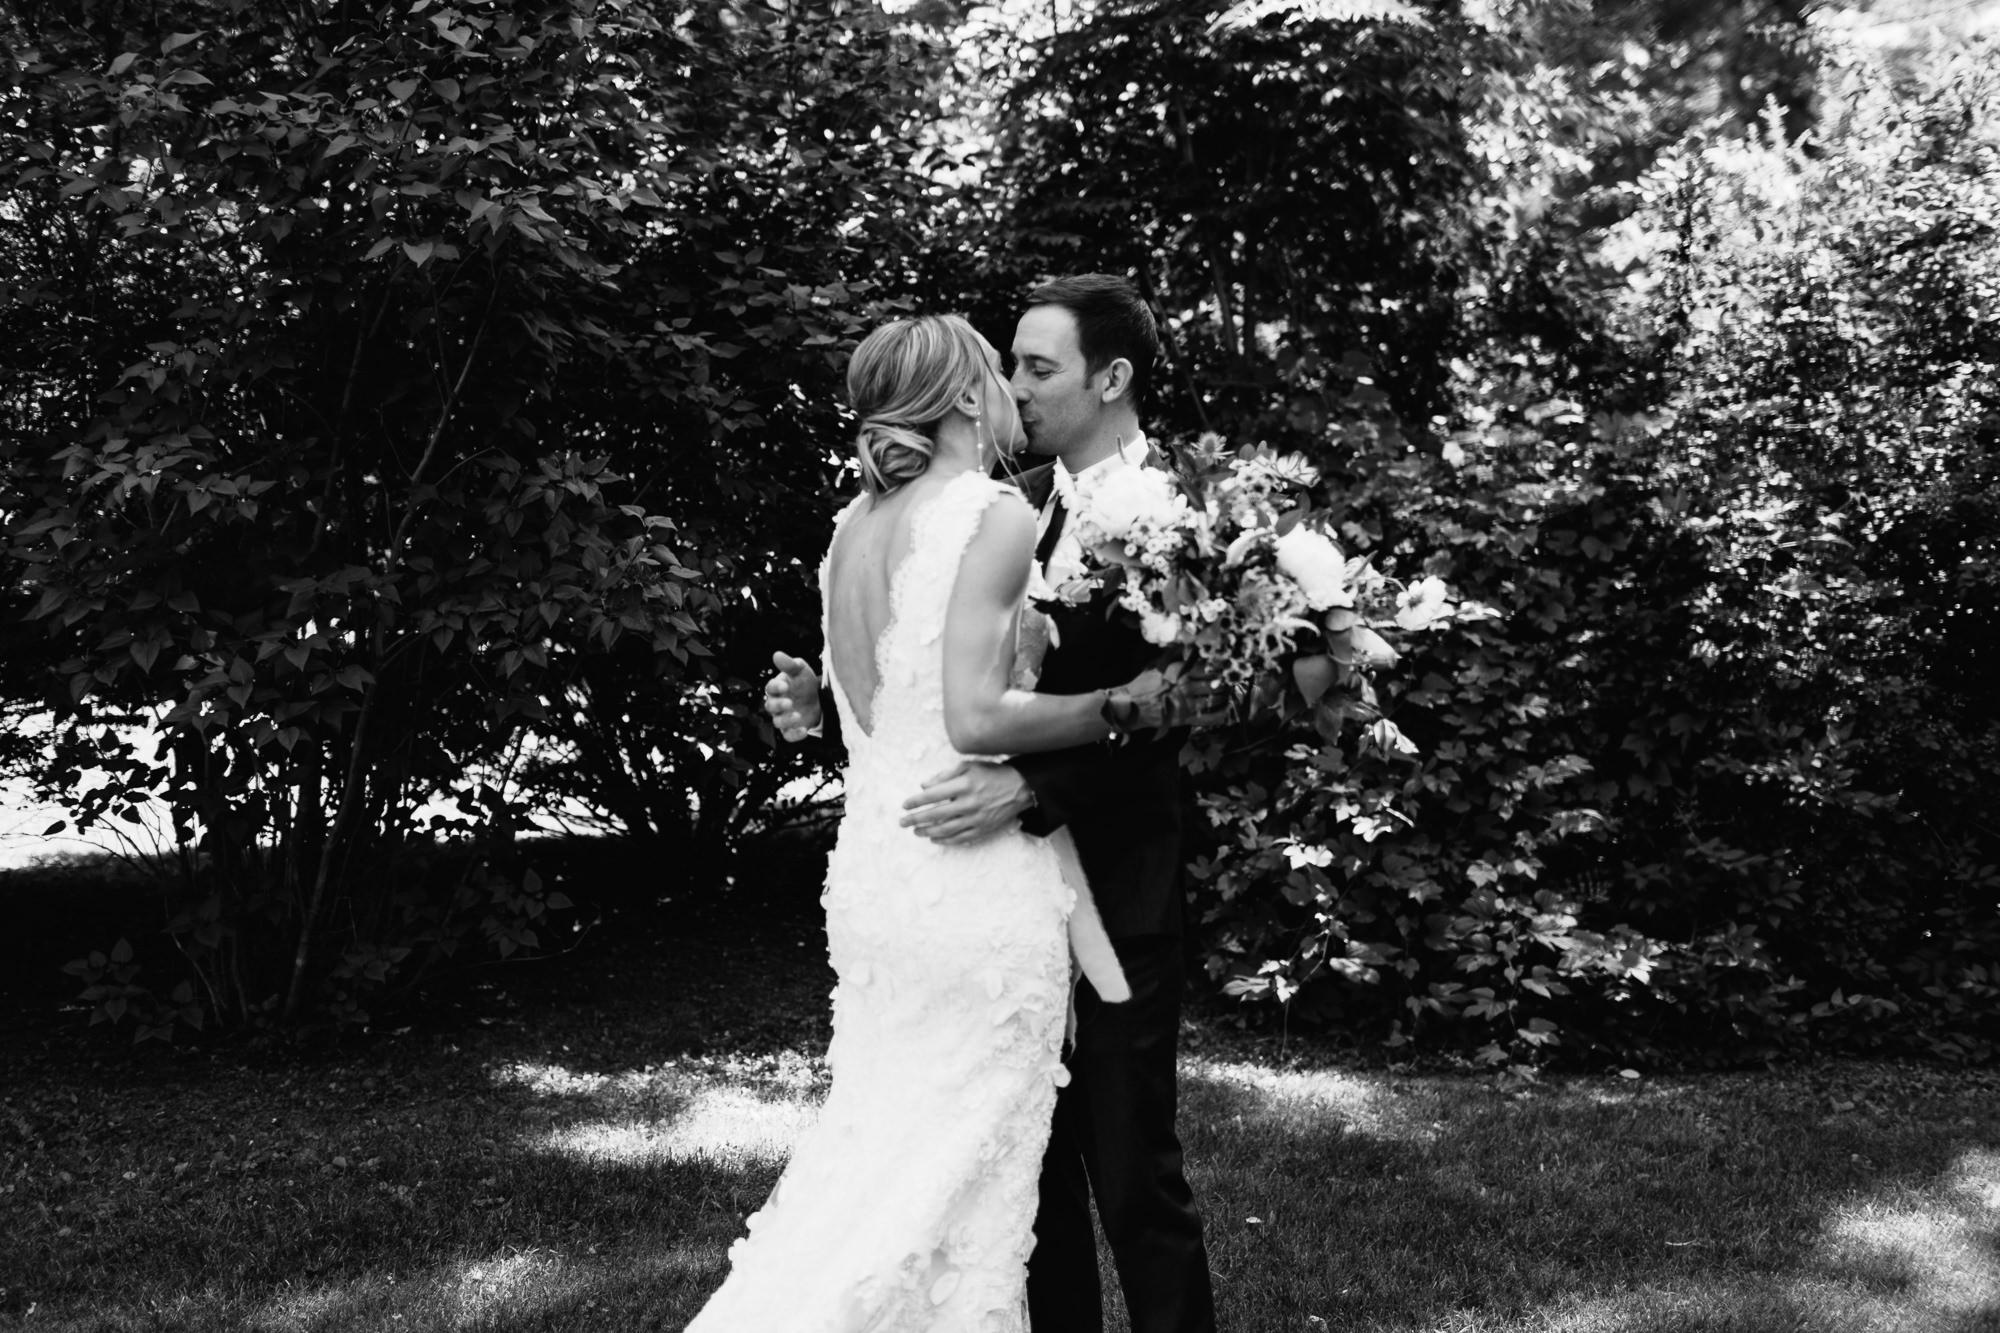 connecticut-summer-lake-wedding-emily-kirke-photography-upstyle (39 of 181).jpg